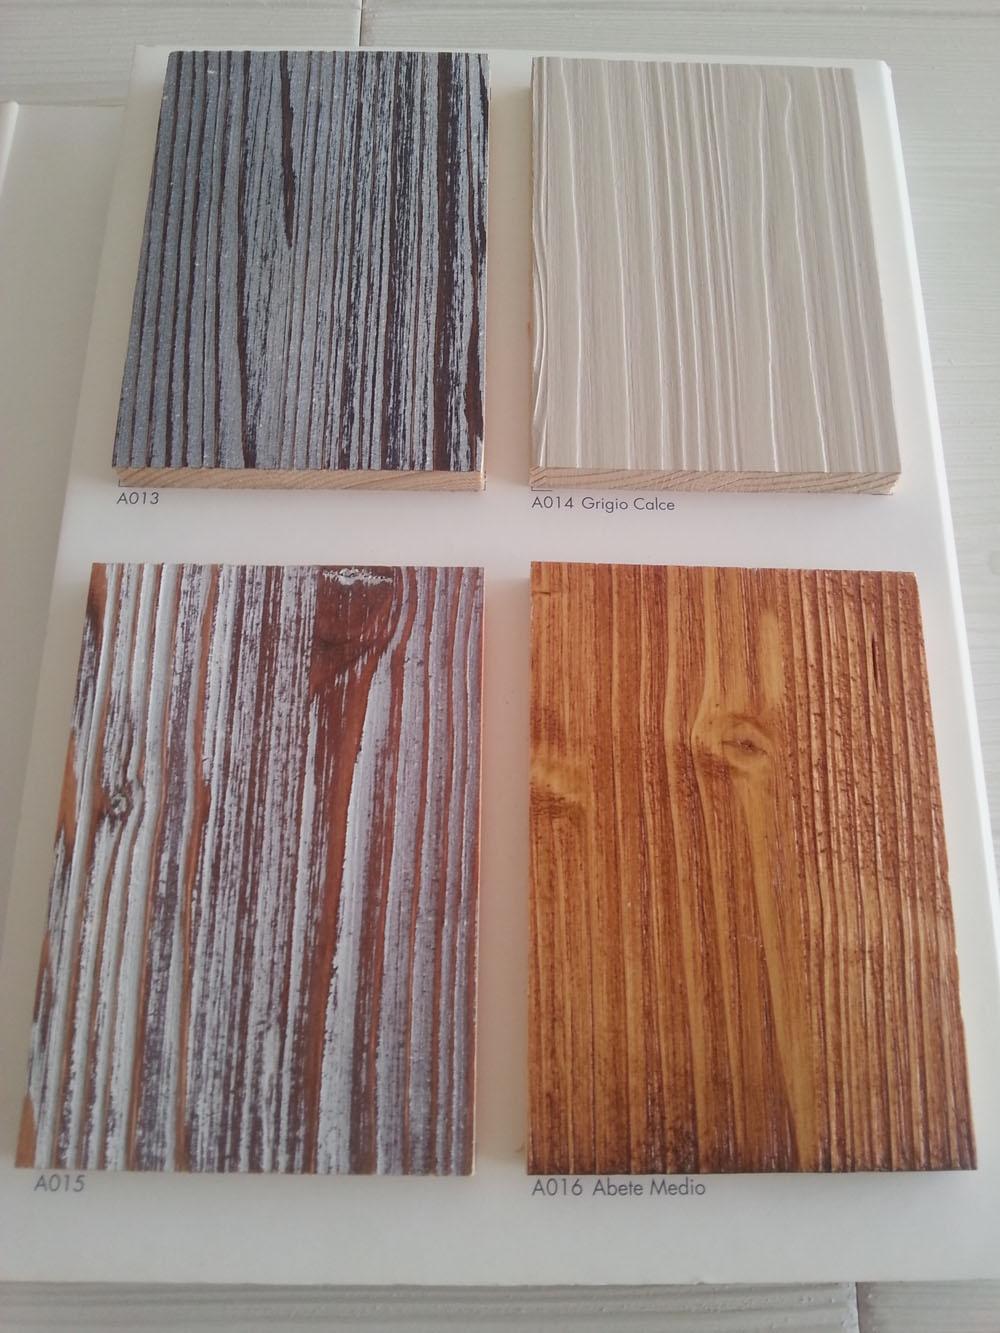 Soggiorno mirandola madia wood and city legno madie design for Madie design outlet